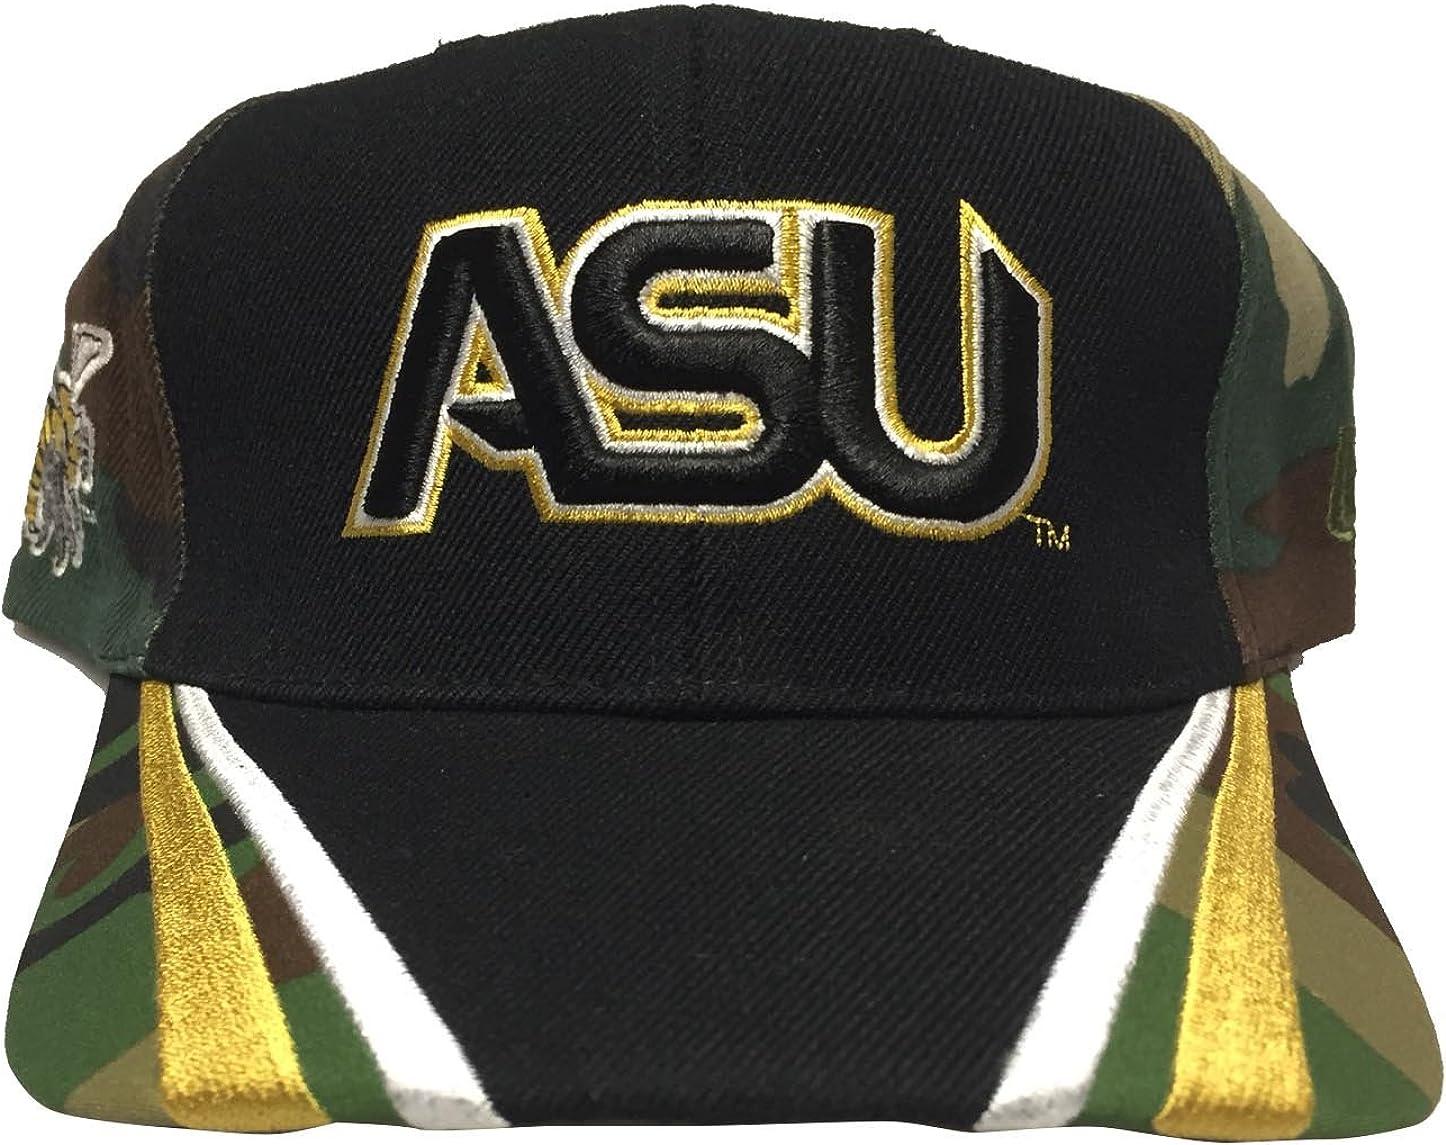 Big Boy Gear Alabama State University Camo//Bk Hat Cap HBCU Historically Black University Adjustable College Baseball Hat Dad Cap